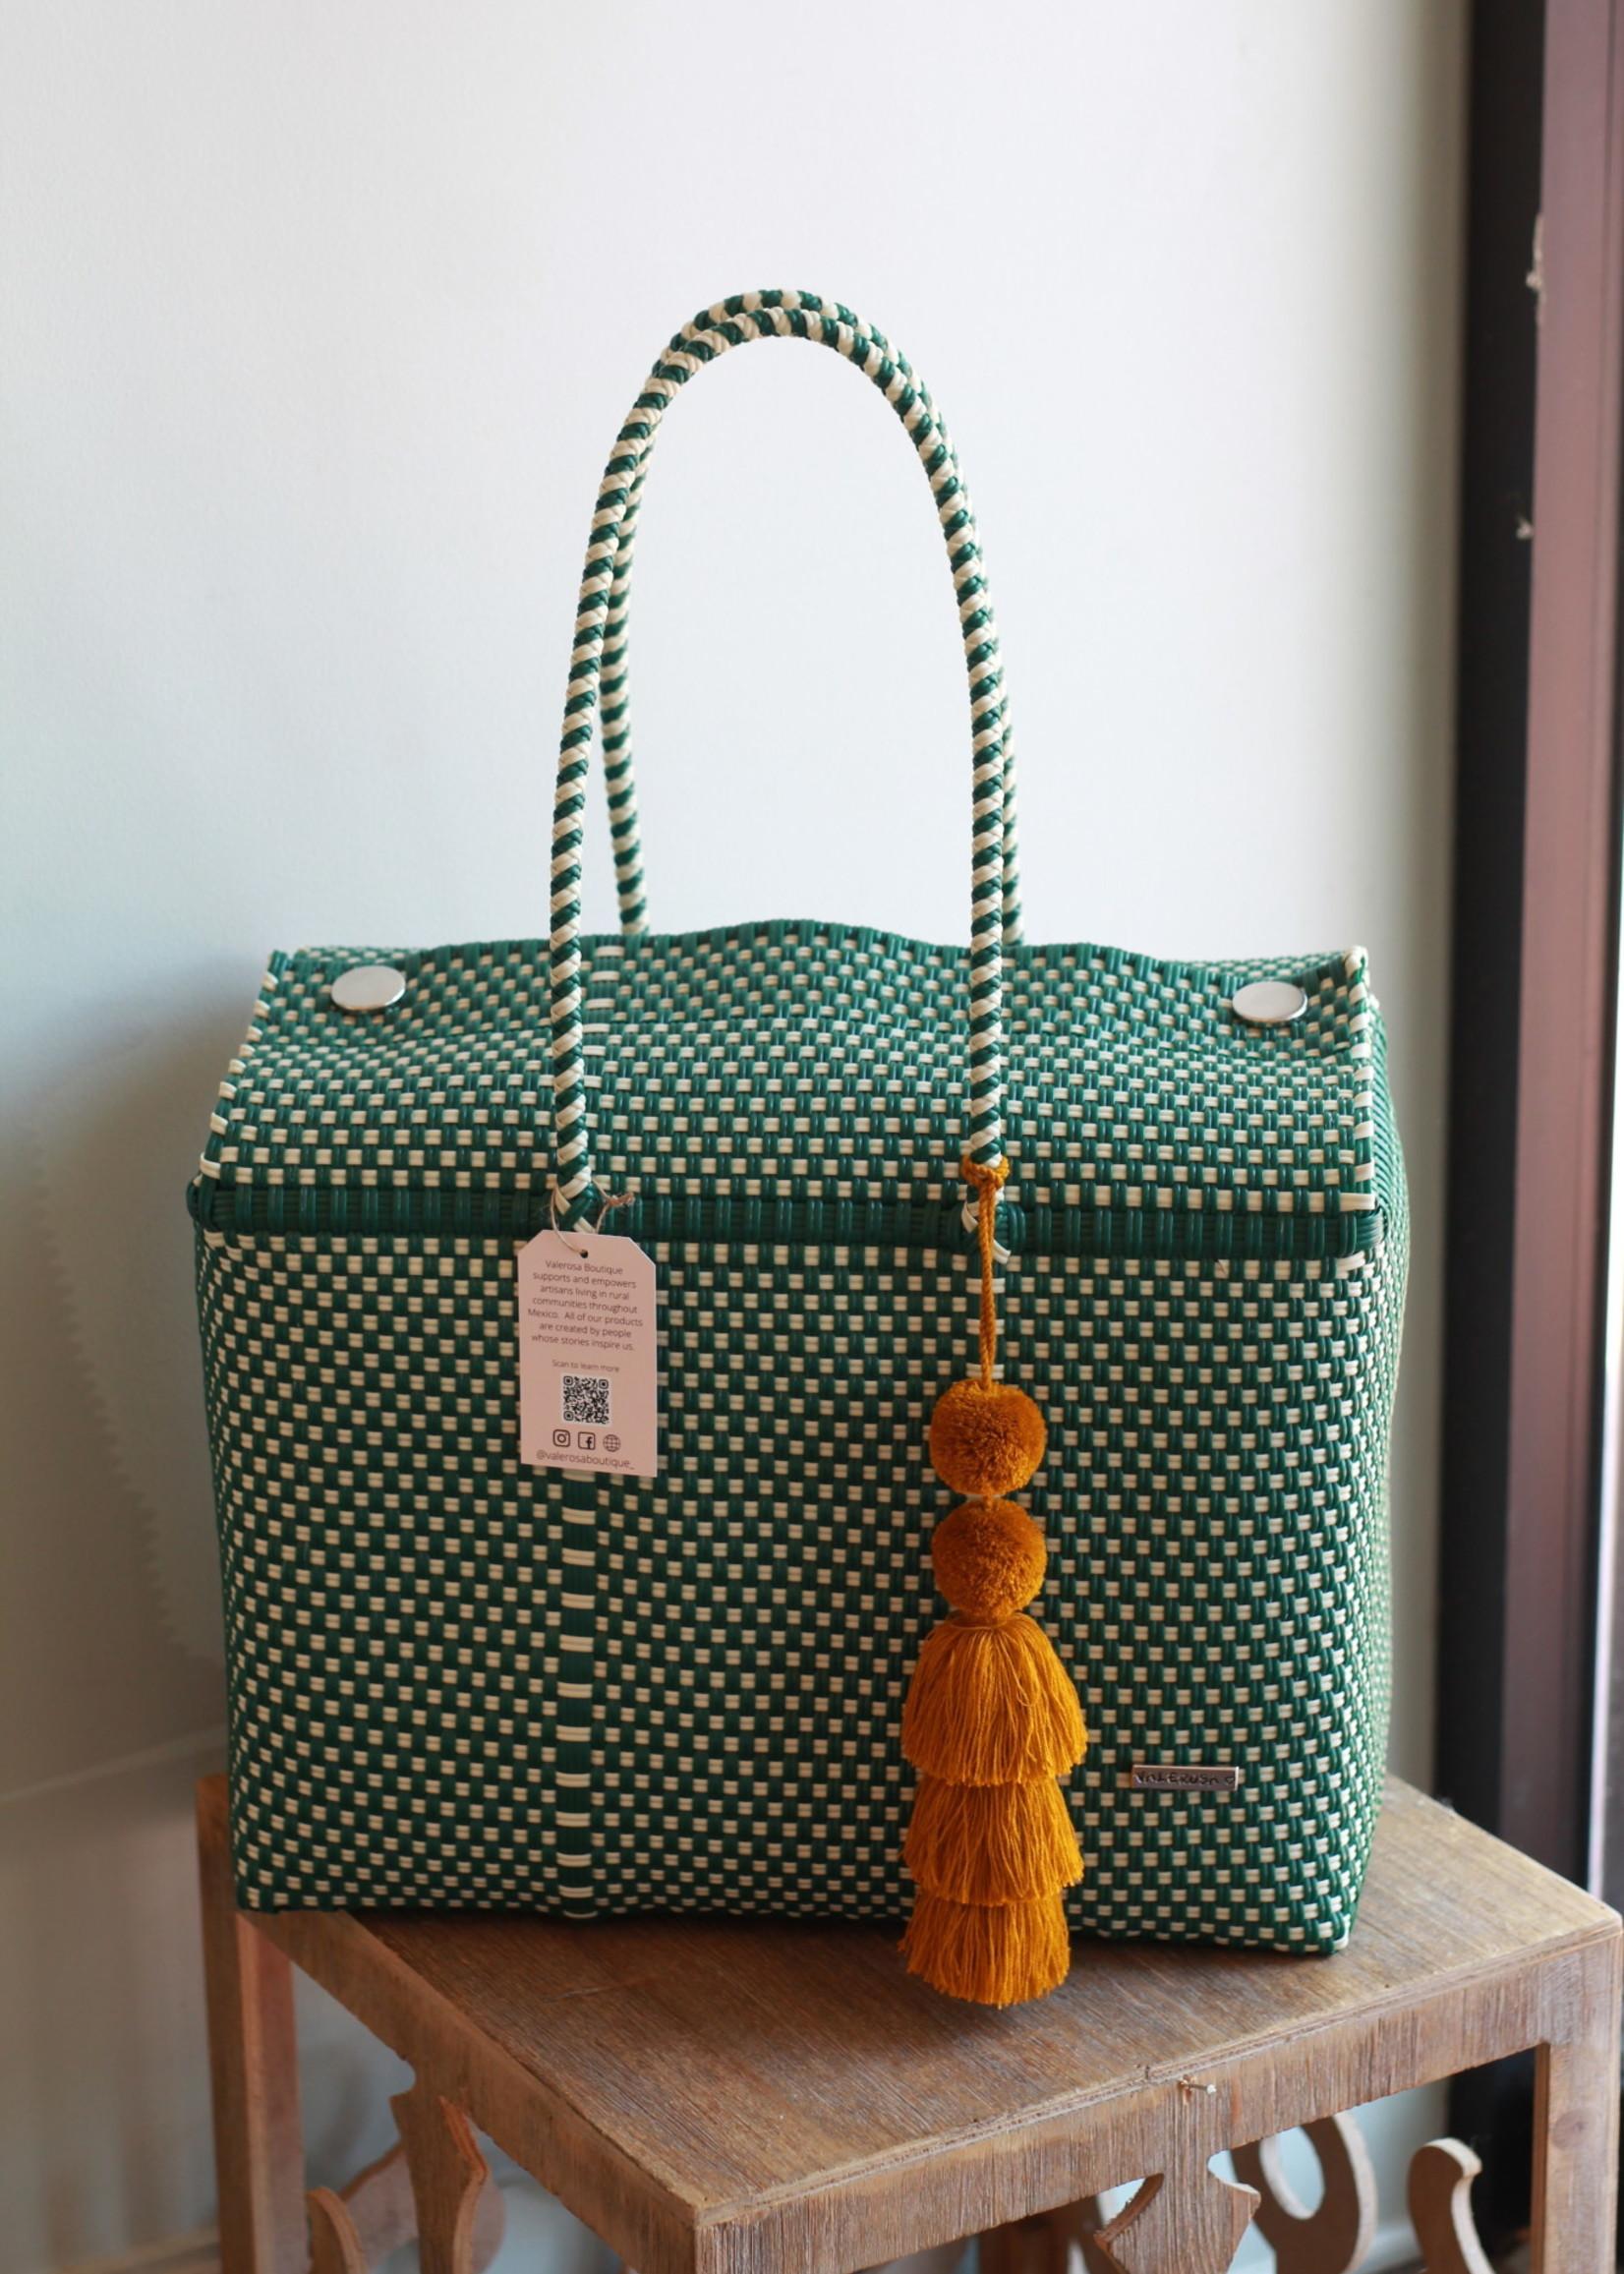 Valerosa Boutique Valerosa  Evergreen Dia Duffle Bag With Gold Tassel